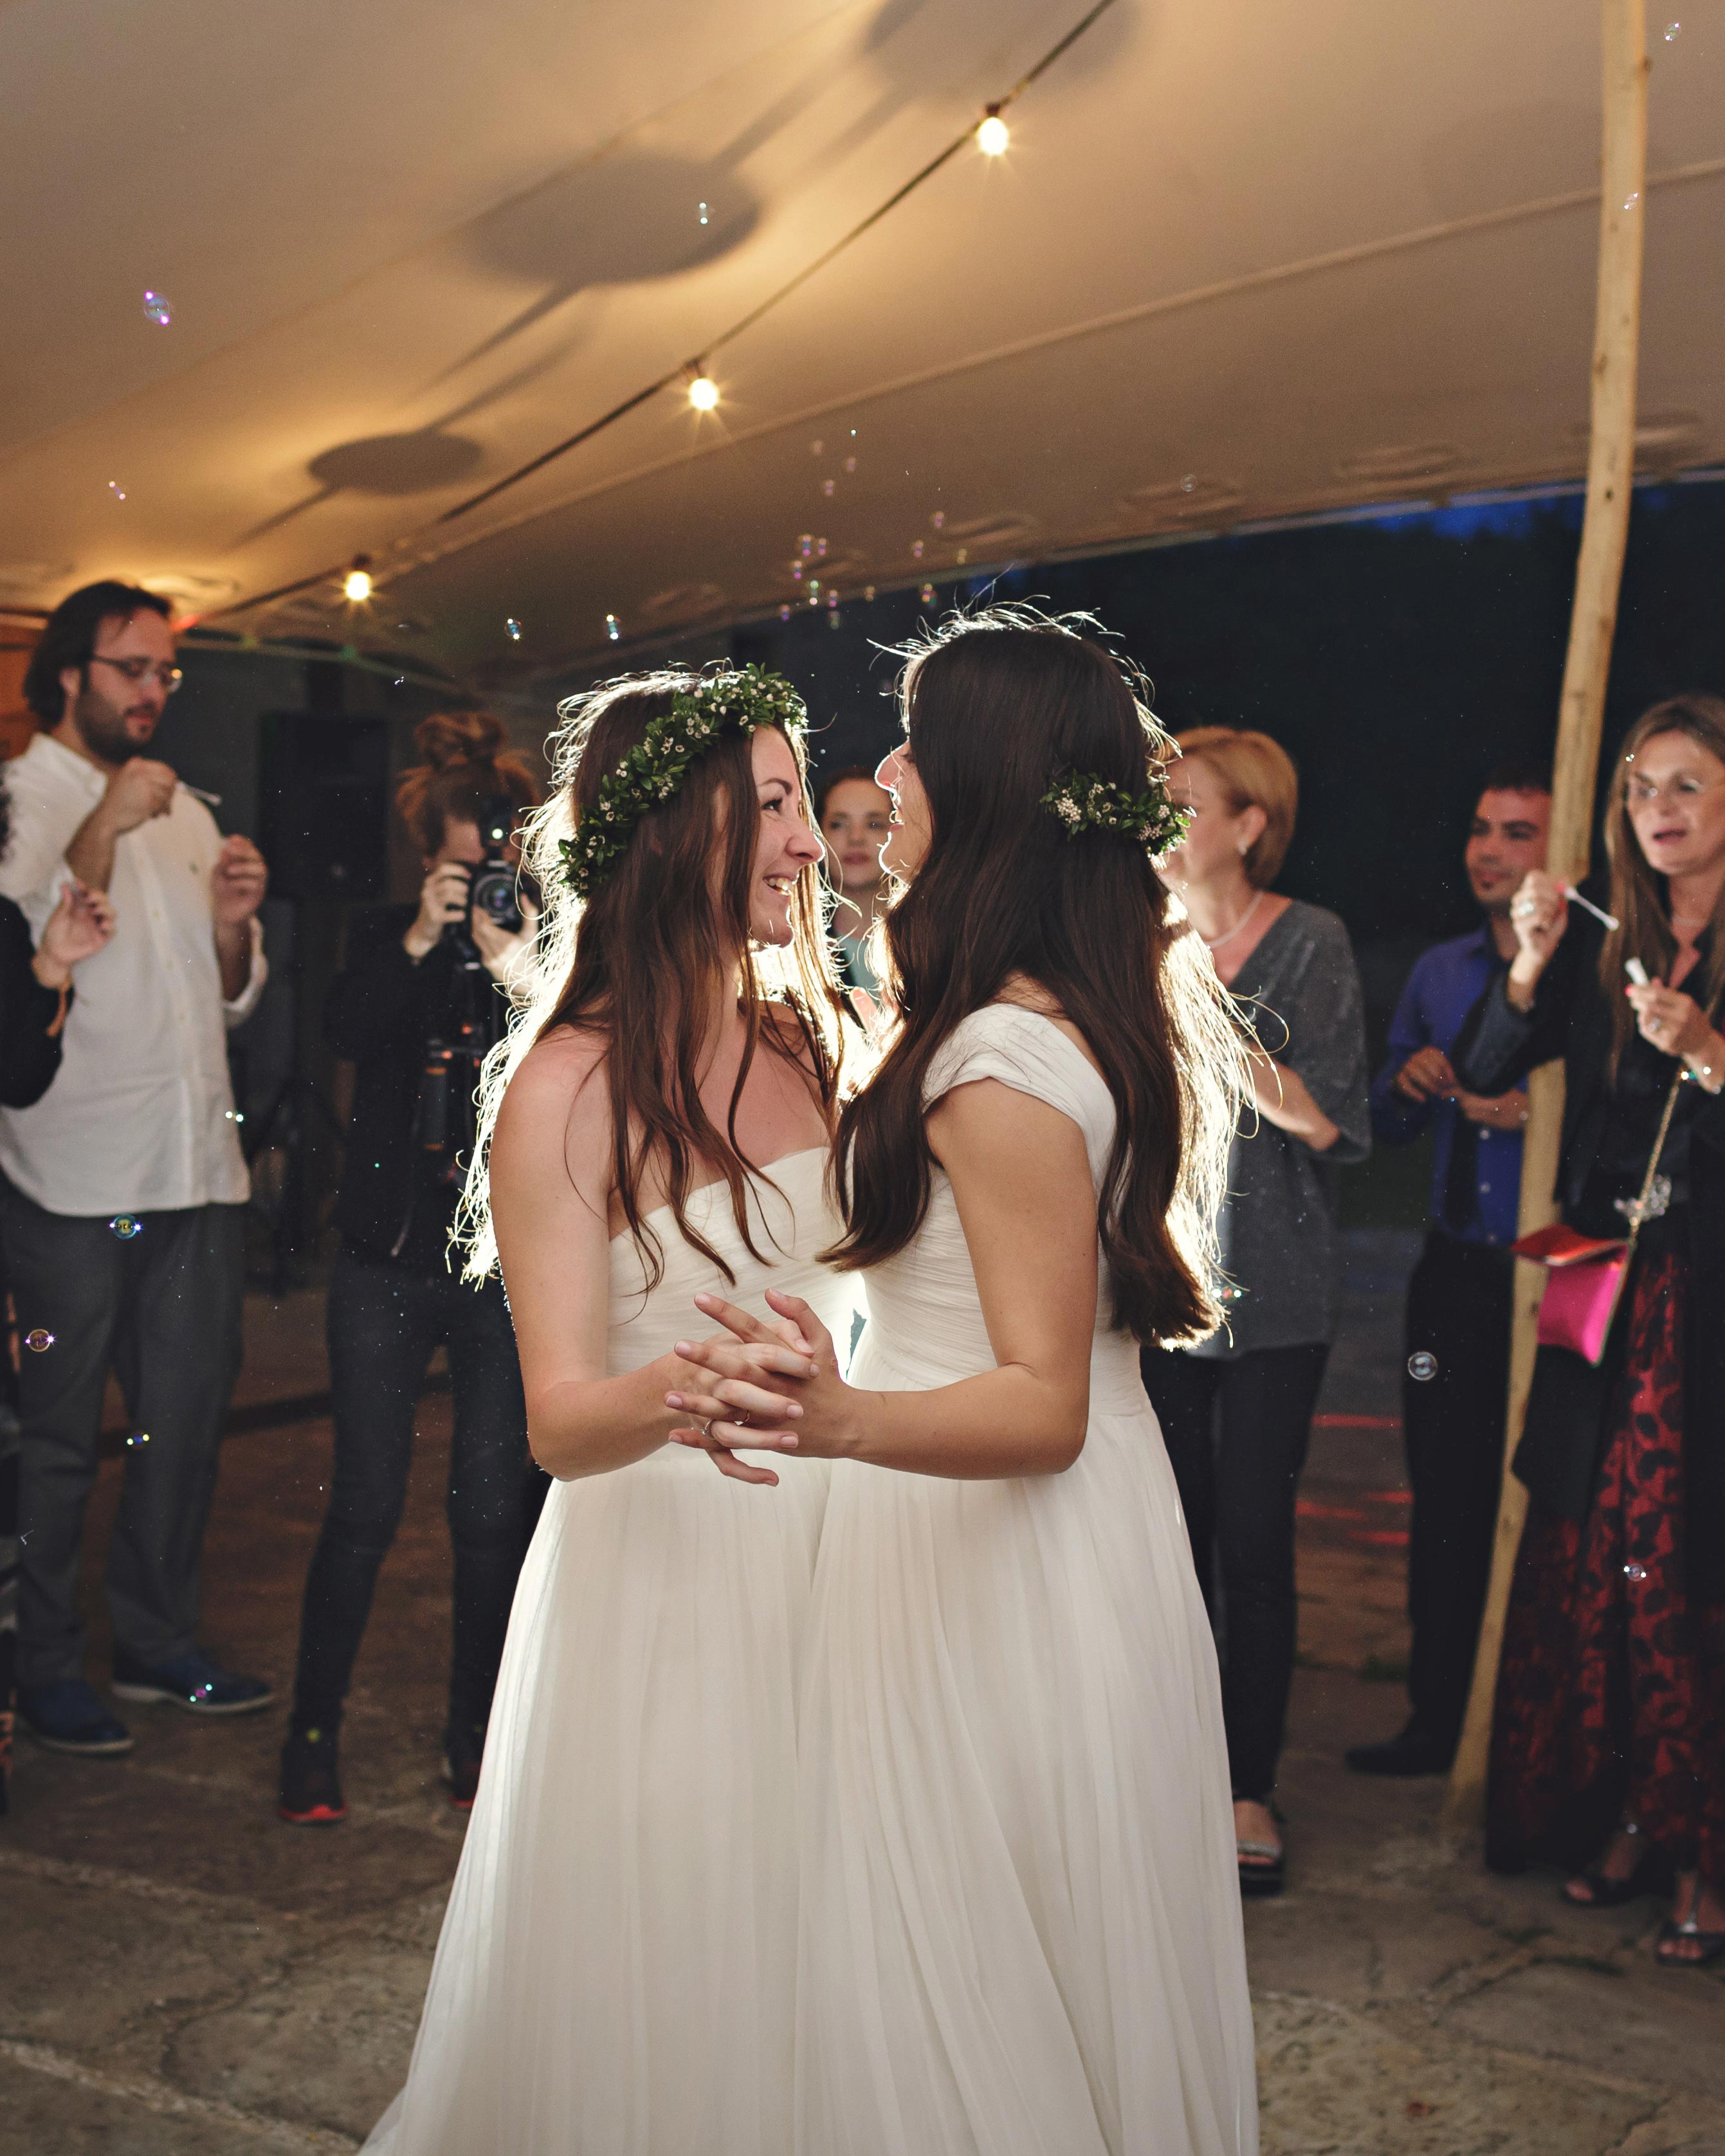 anna-ania-wedding-firstdance-107-s112510-0216.jpg